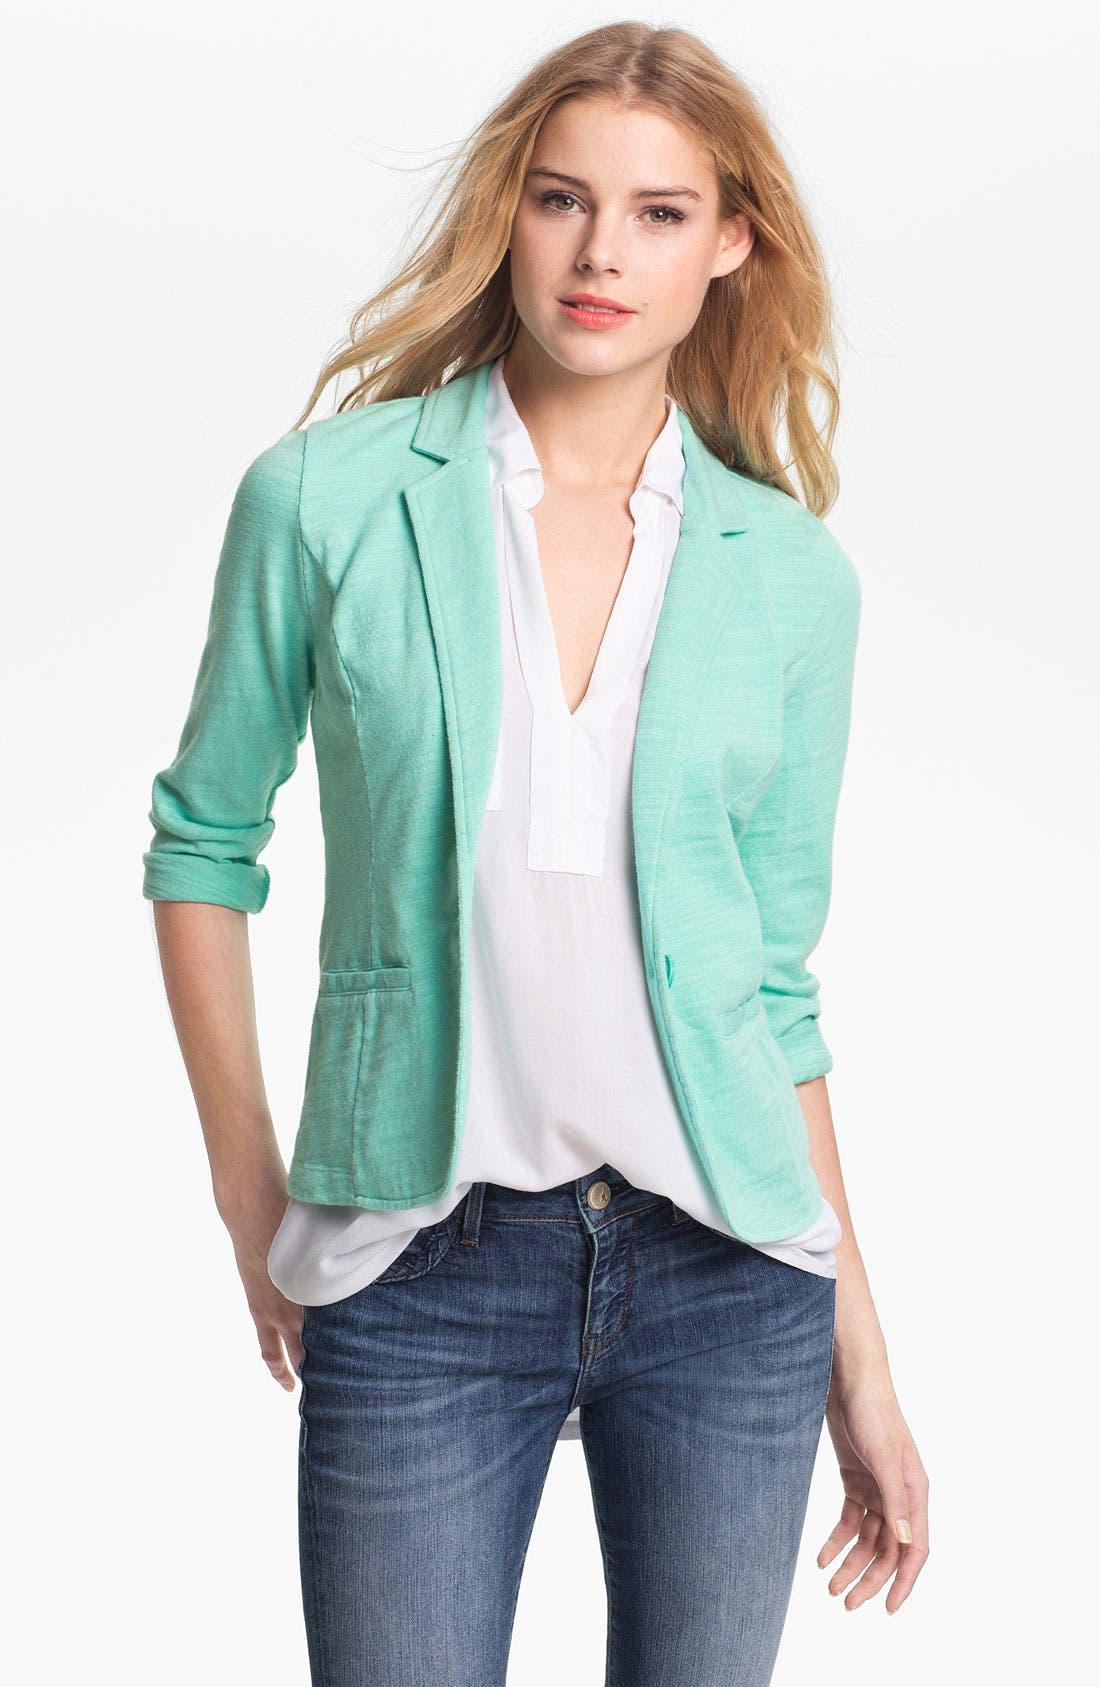 Alternate Image 1 Selected - Caslon® Roll Sleeve Knit Blazer (Petite)